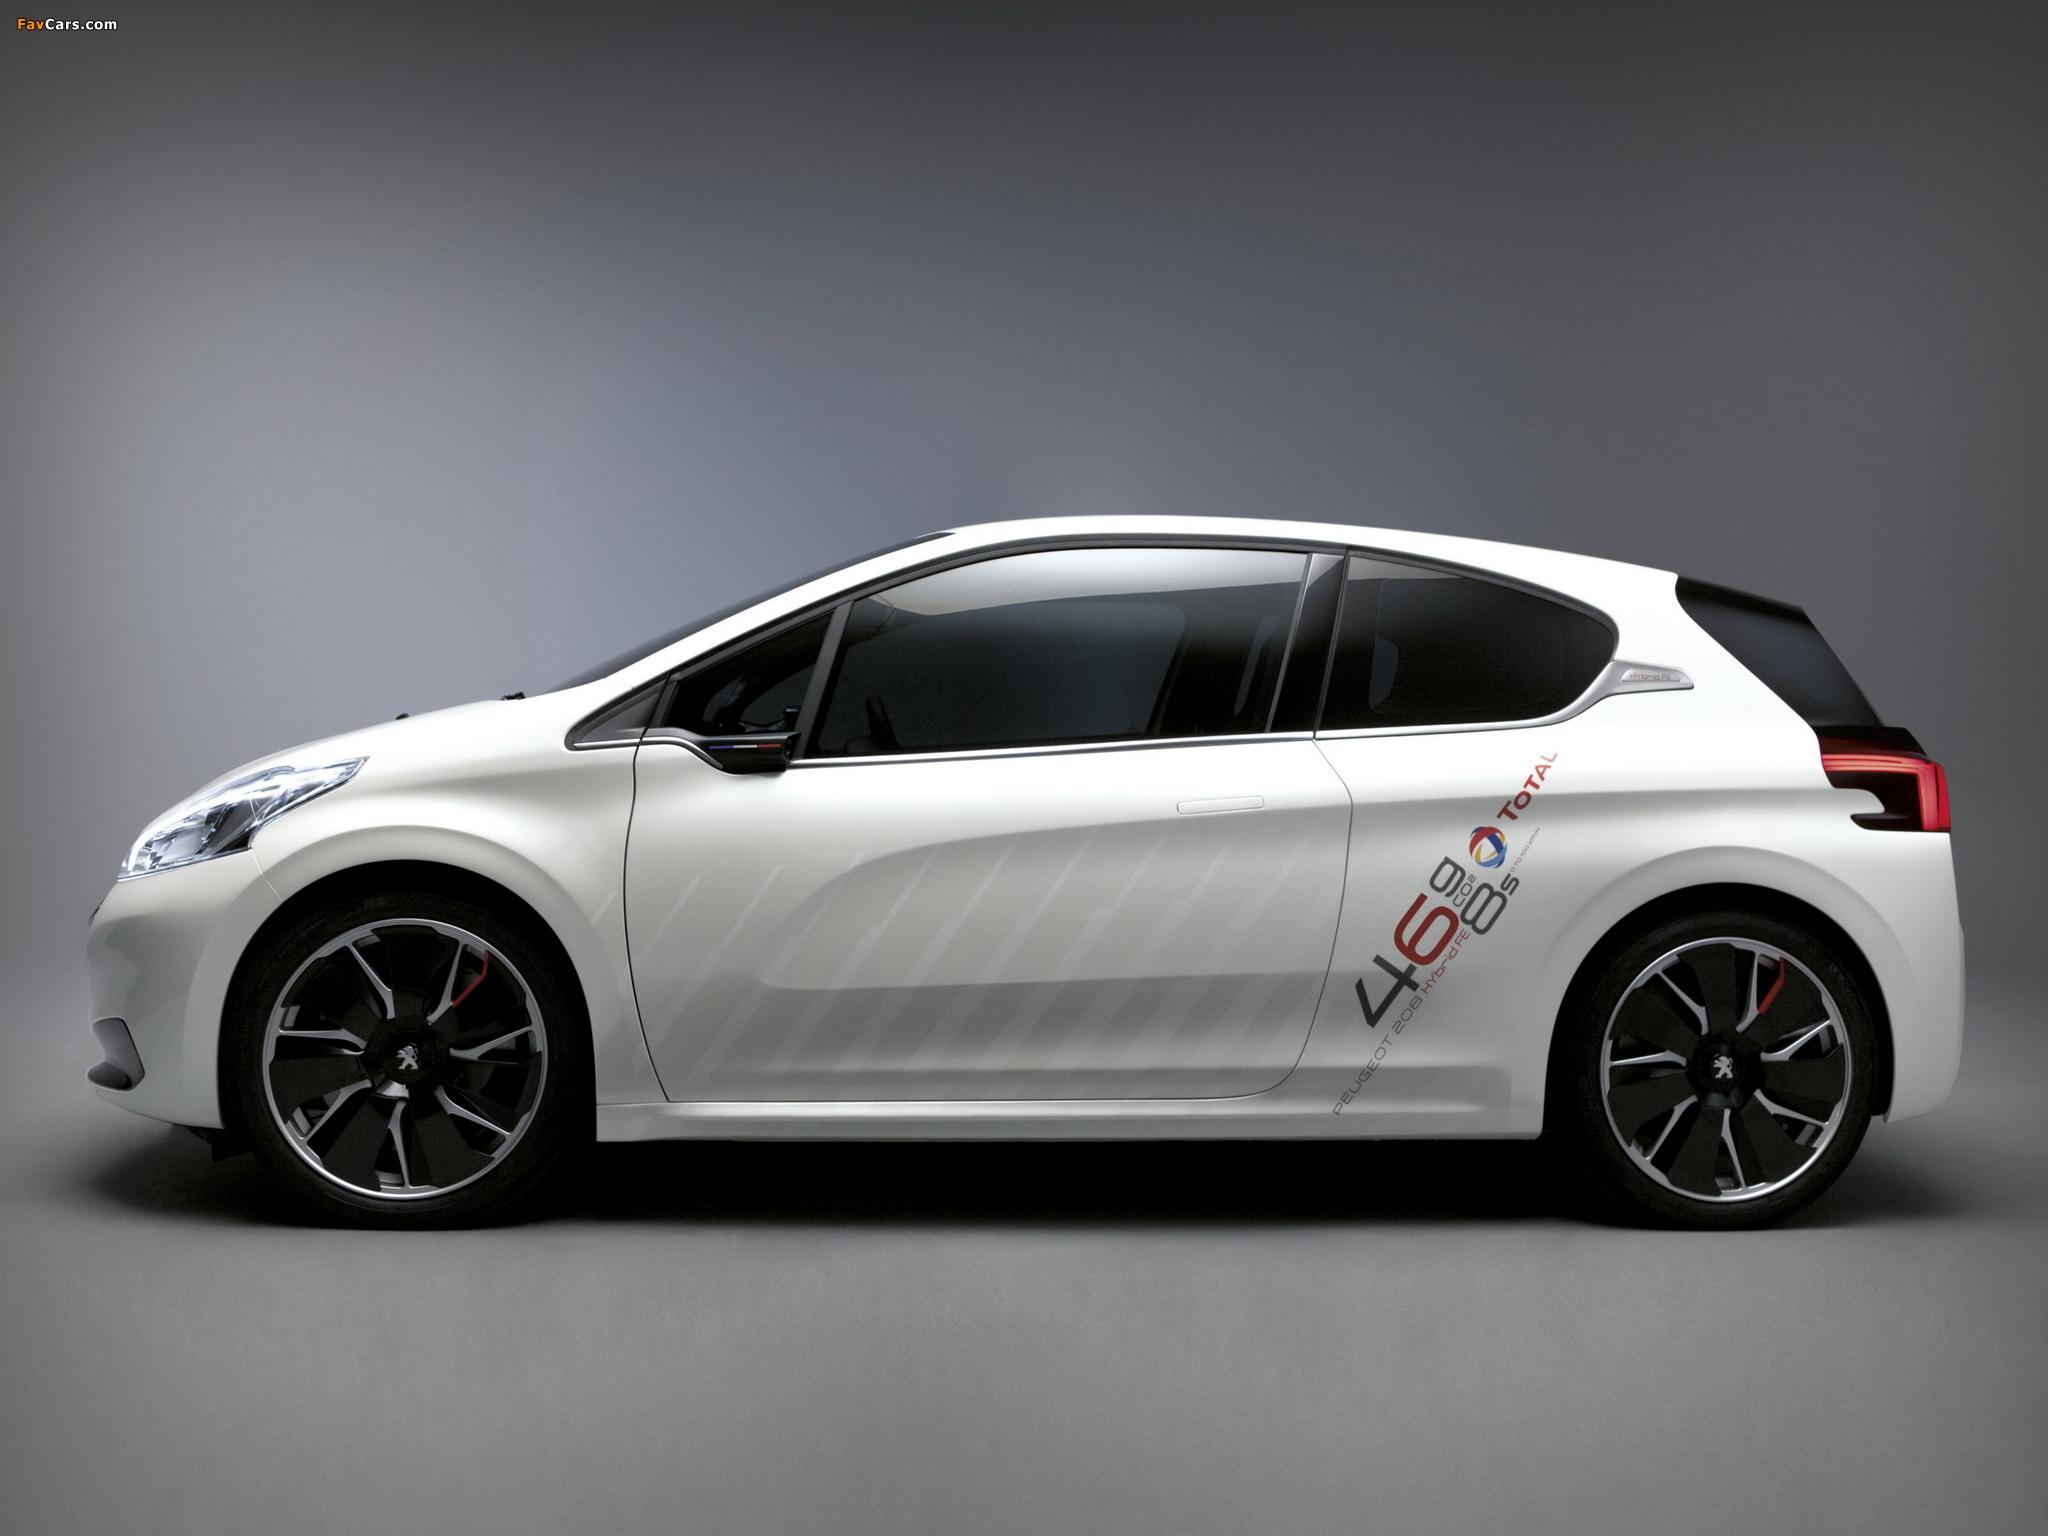 Peugeot 208 HYbrid FE Concept 2013 pictures (2048 x 1536)